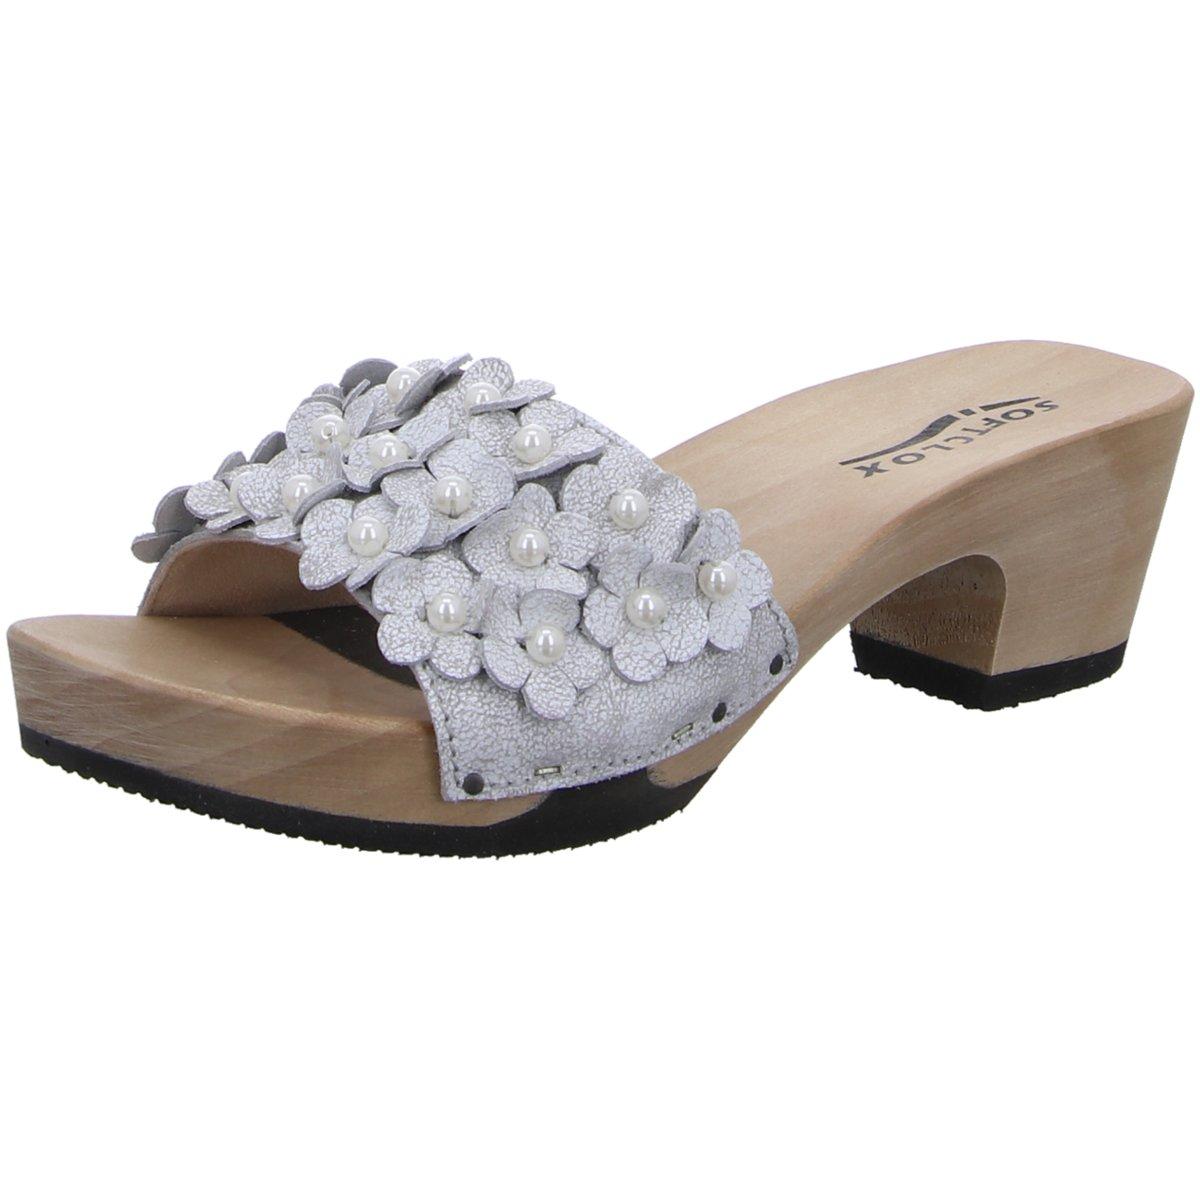 Softclox Damen Pantoletten Kati S3430-03 Matrix White Kaleido Kaschmir S3430-03 Grau 474656 fzqujHj